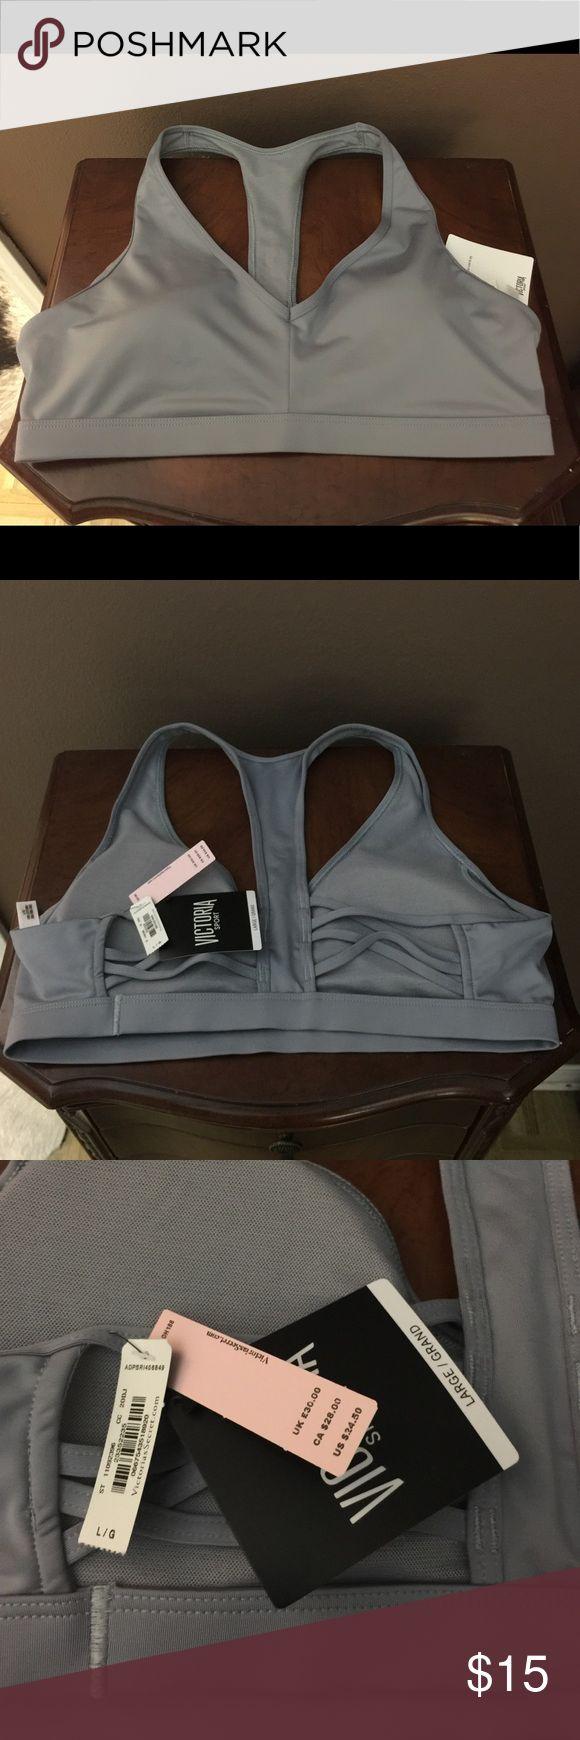 Victoria's Secret sports bra Silver sports bra. Racerback. Brand new. Size large. Removable padding. Victoria's Secret Intimates & Sleepwear Bras